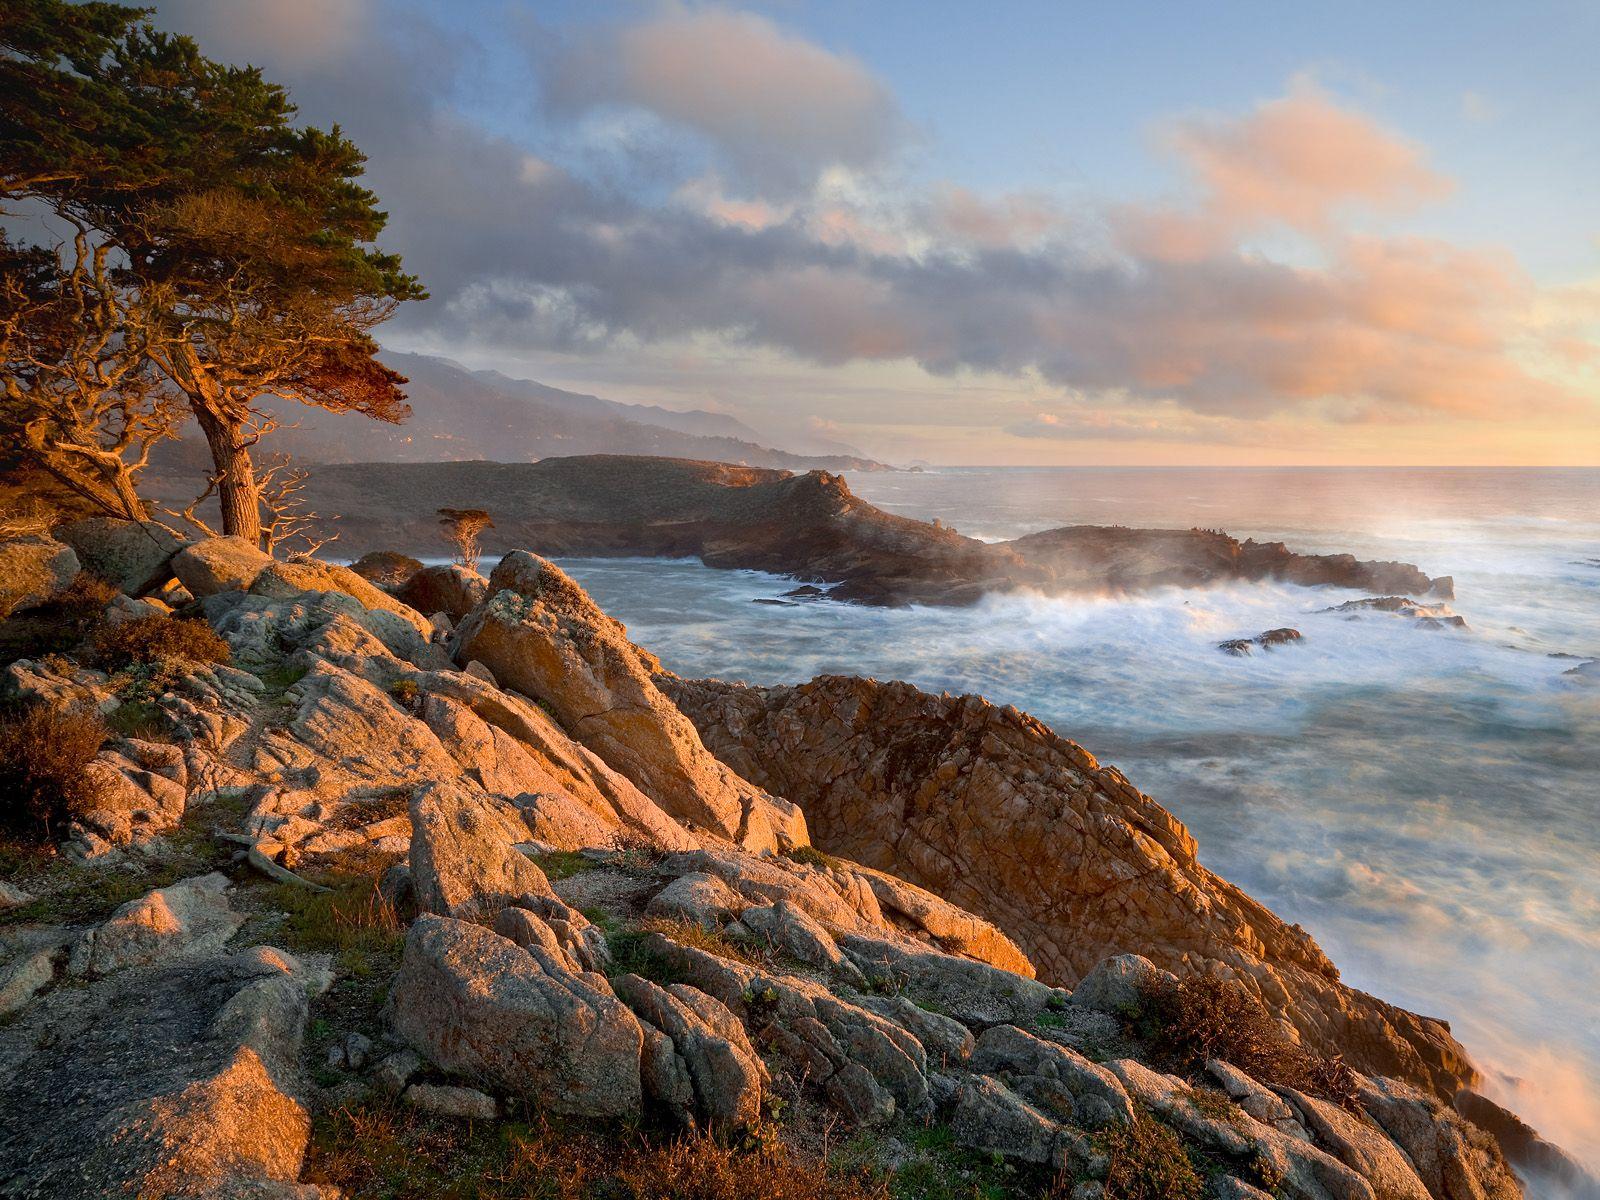 headland cove point lobos state reserve california my favorite rh pinterest com